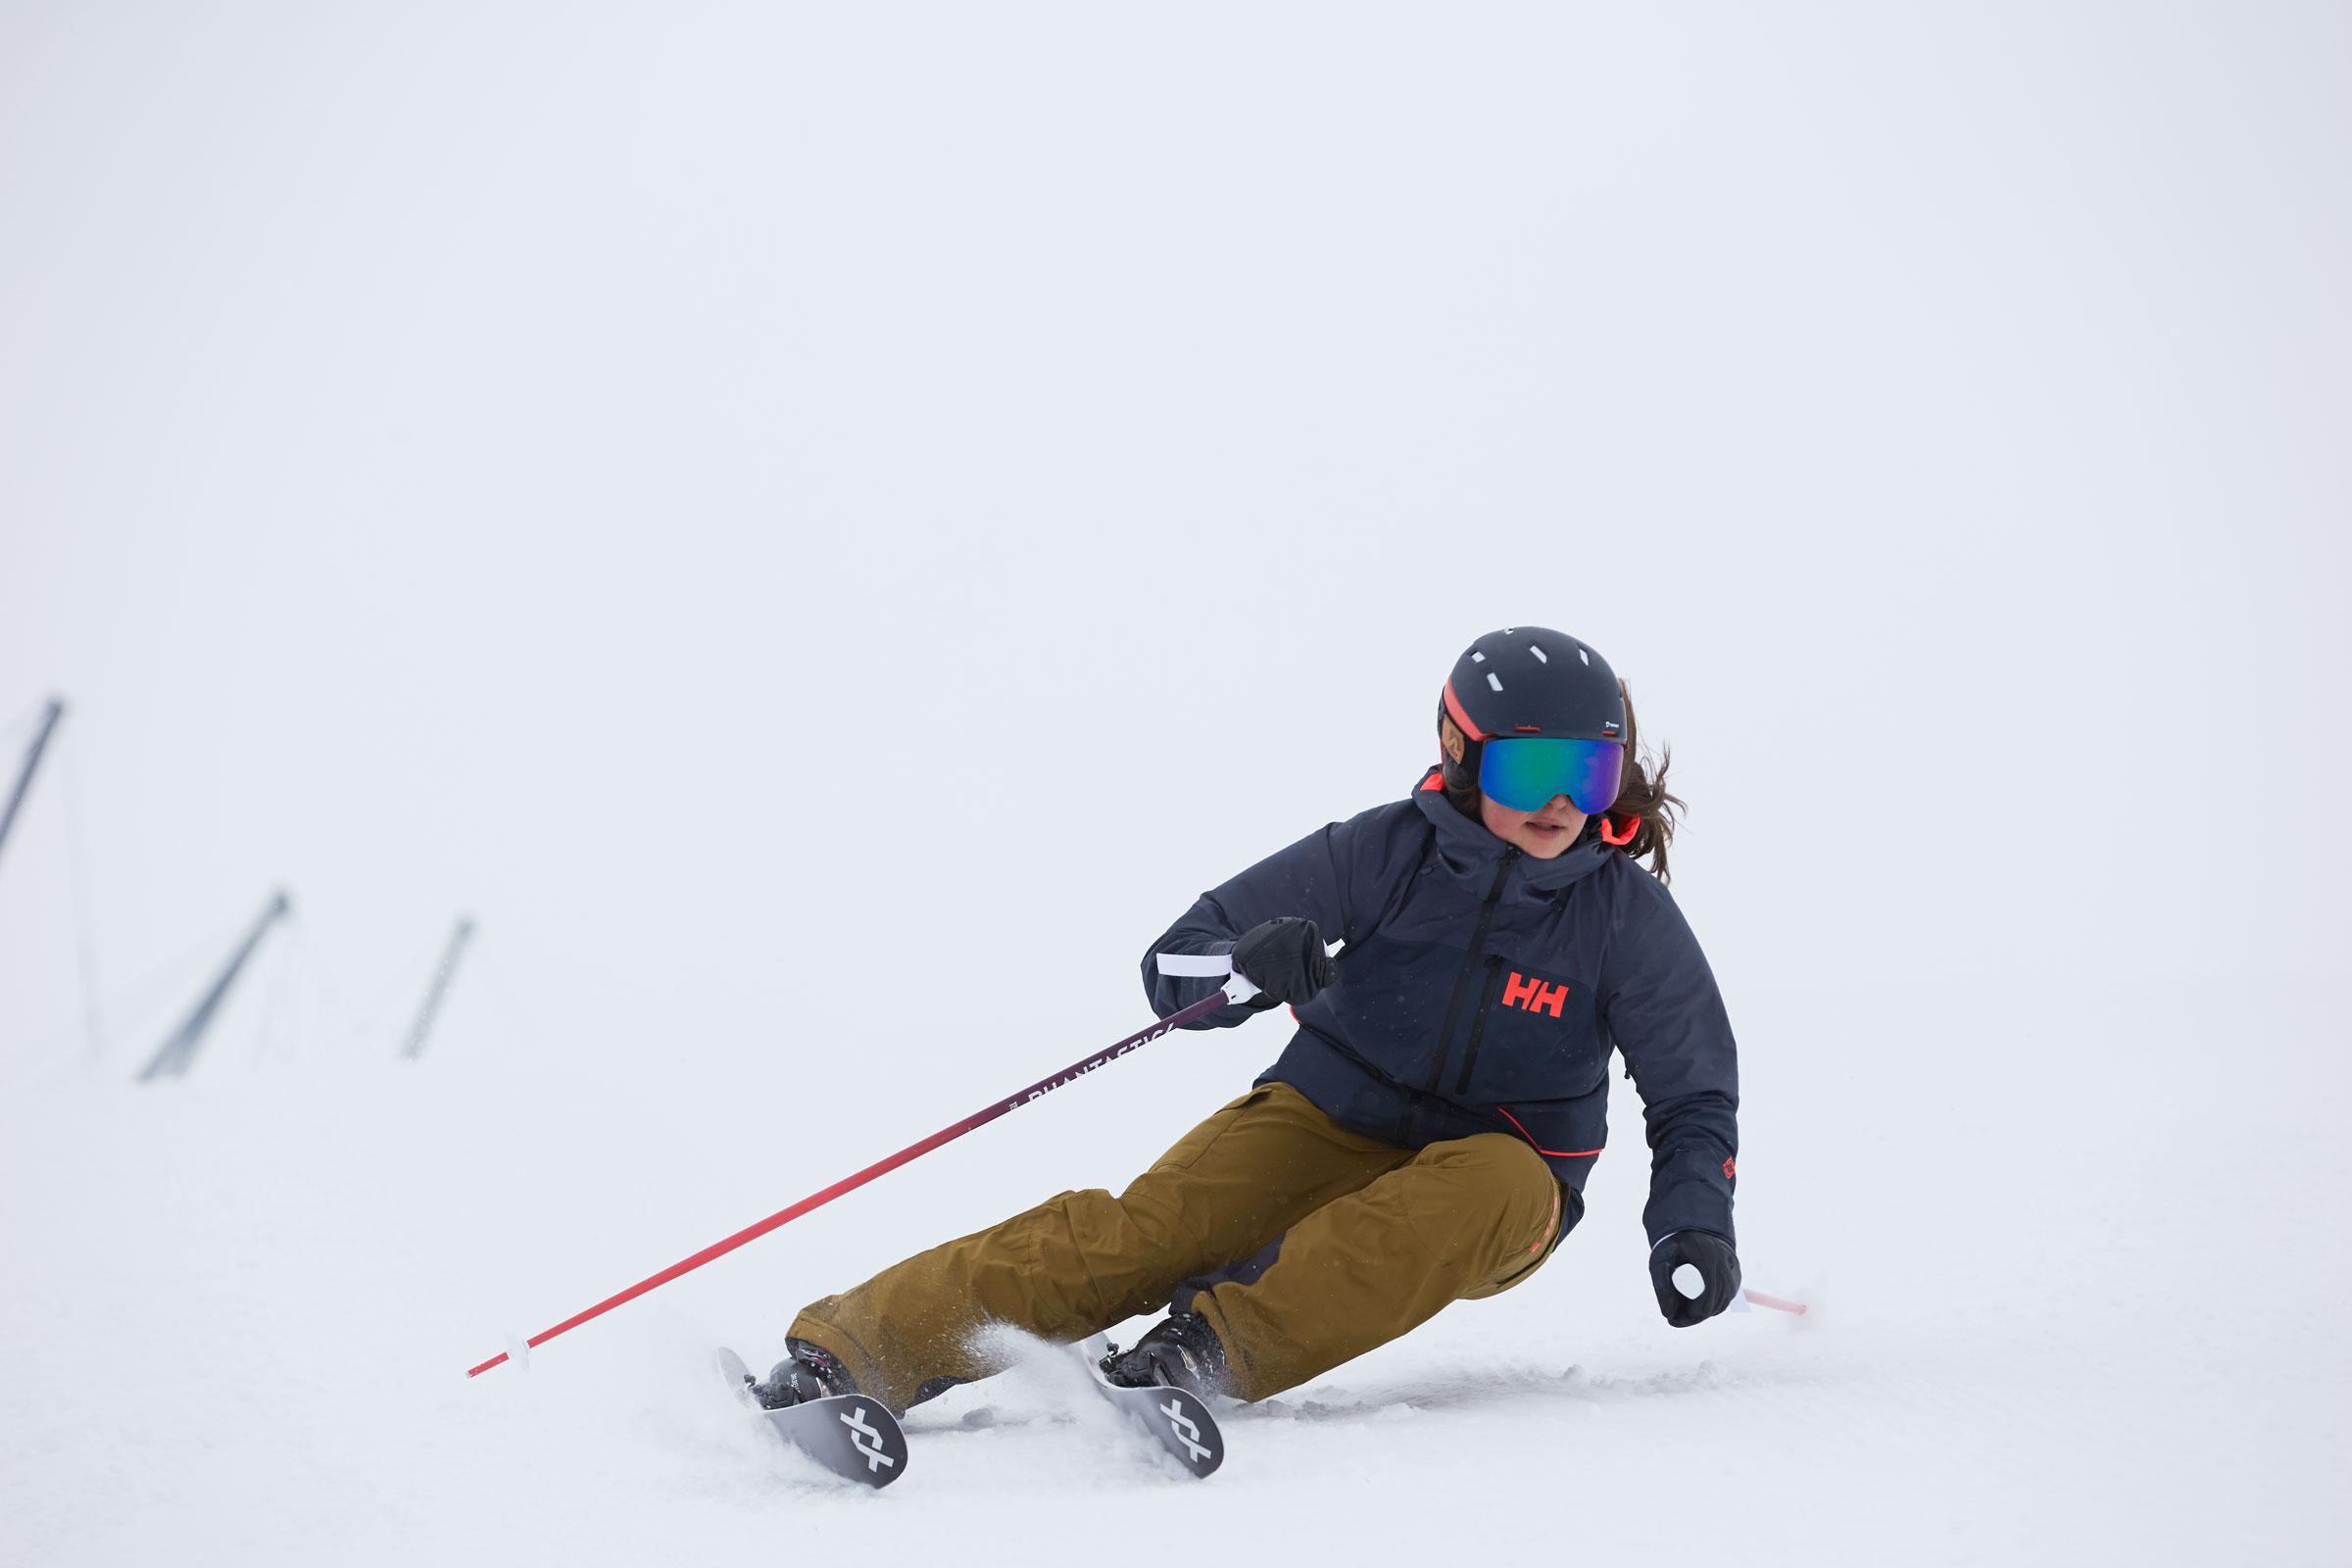 m6 skiing